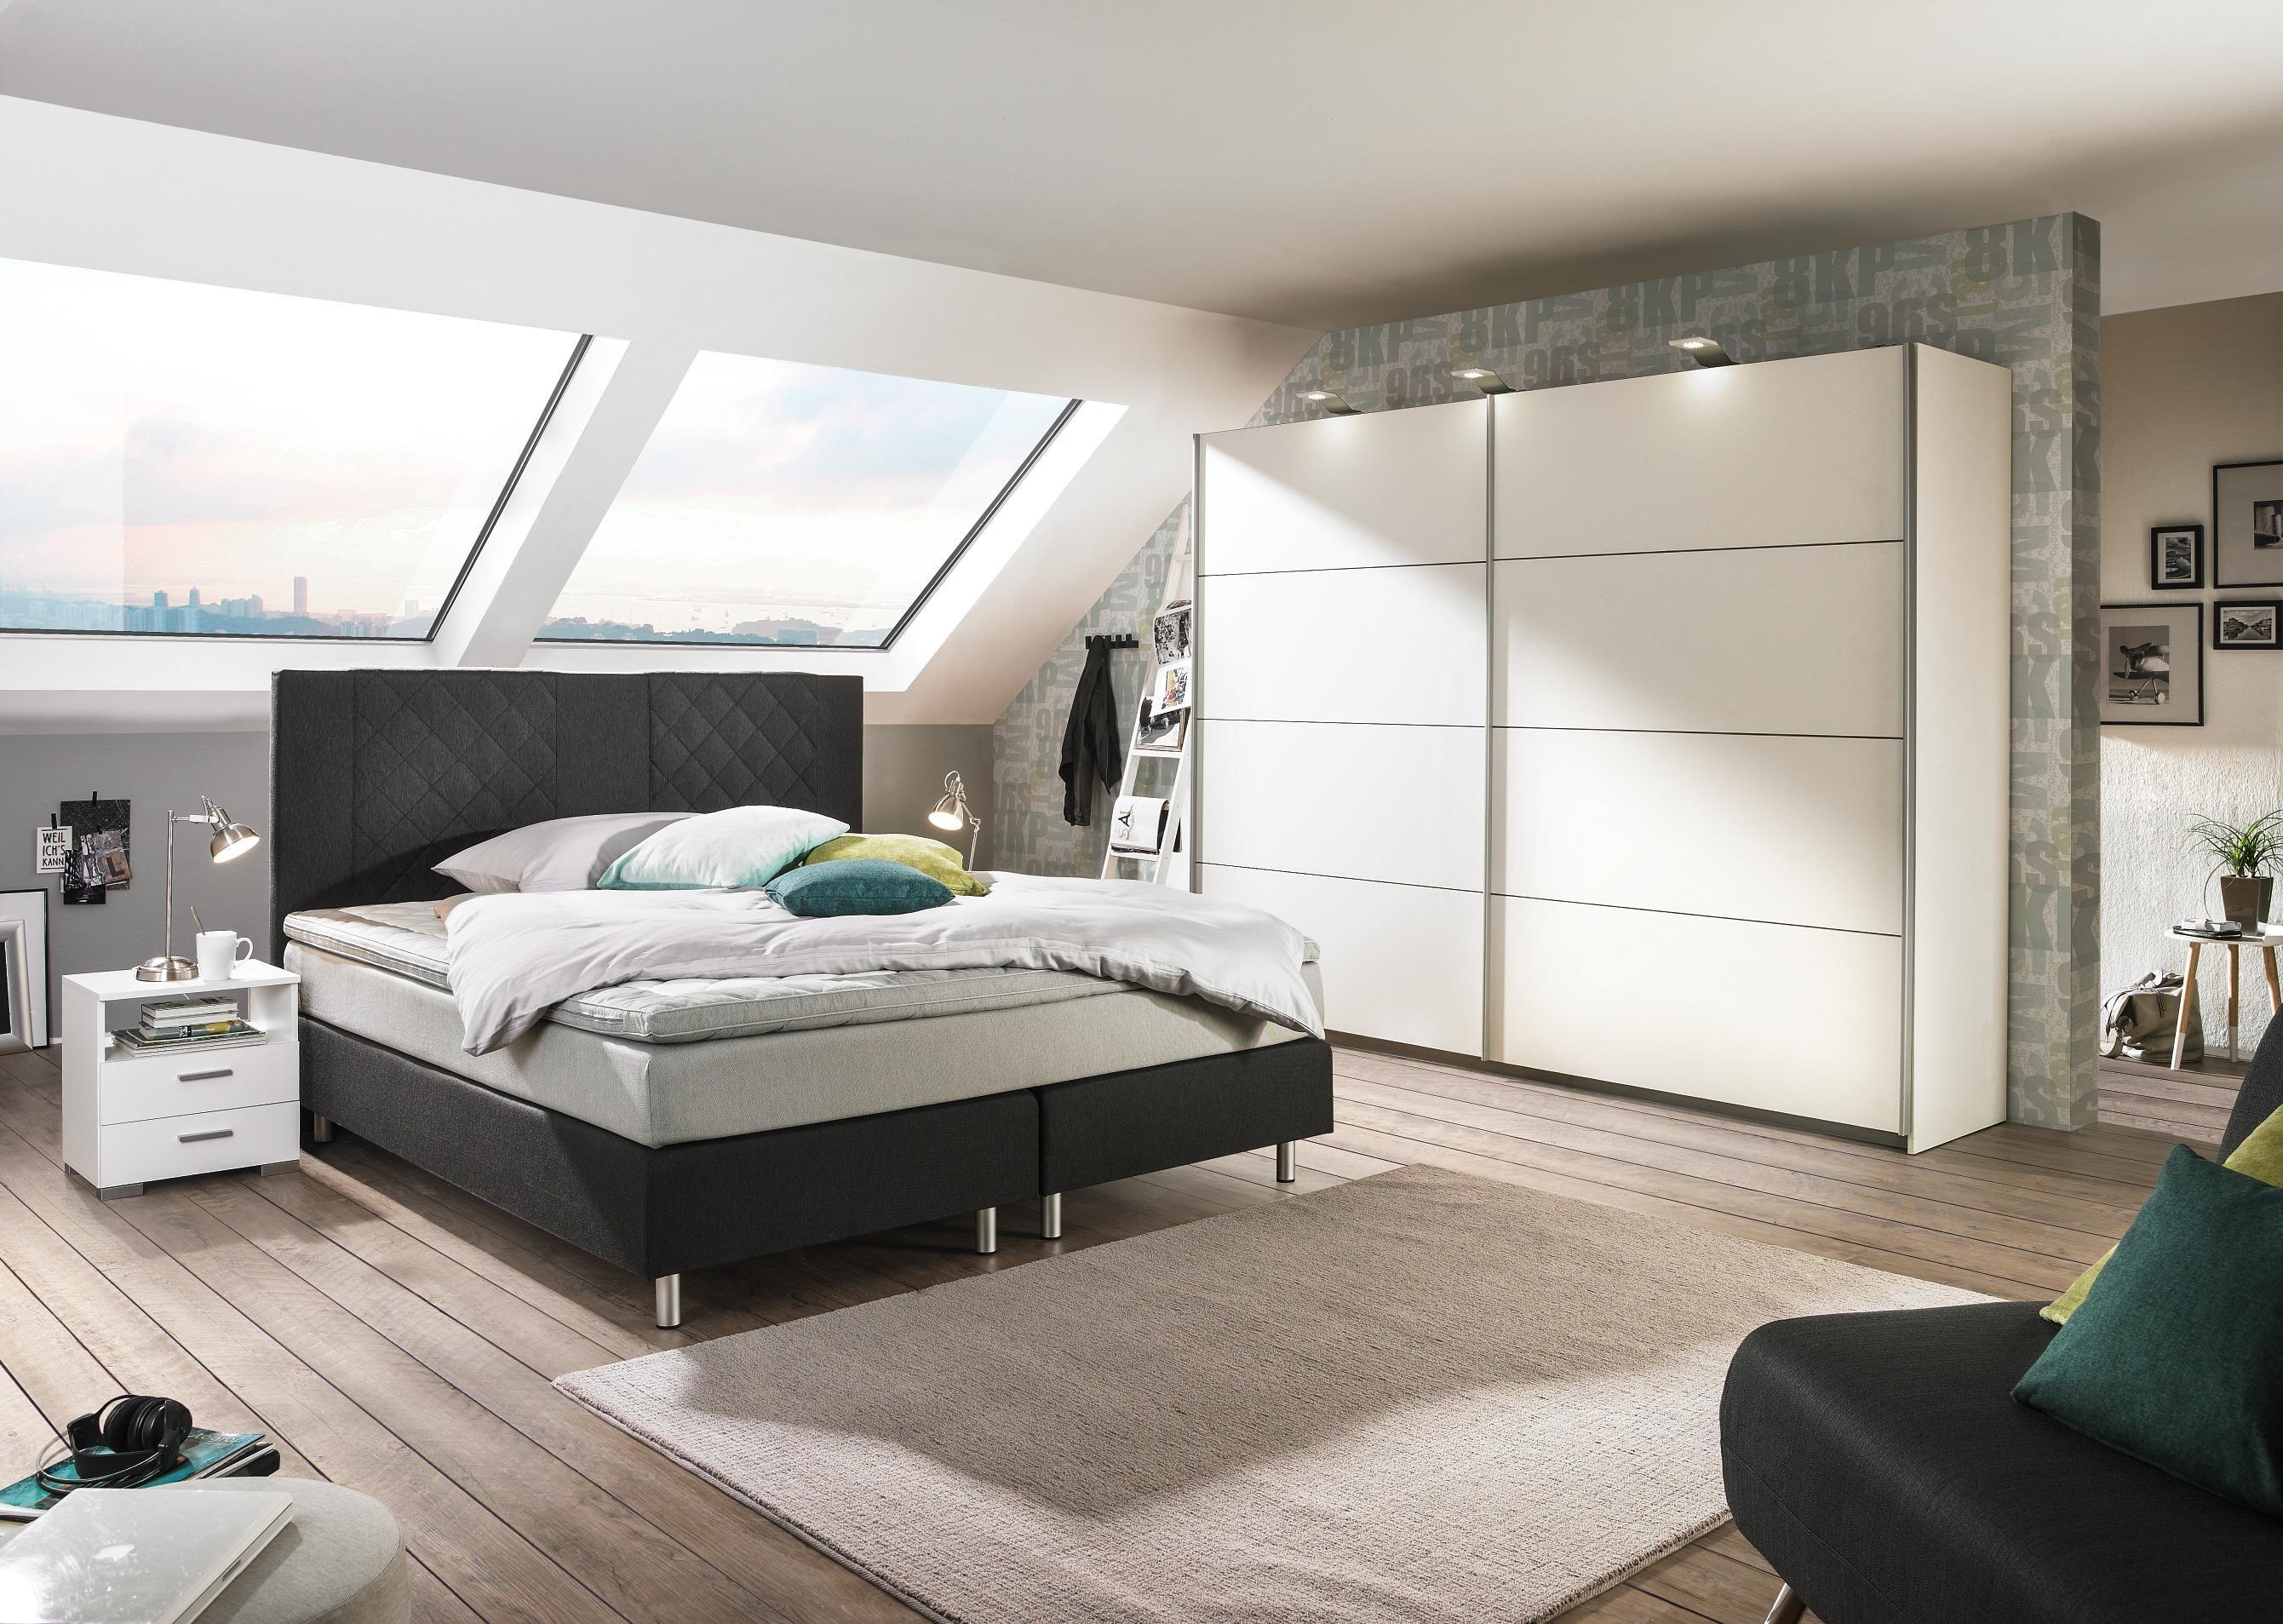 Schlafzimmer Joop ~ Best schlafzimmer images bedroom bed and beds